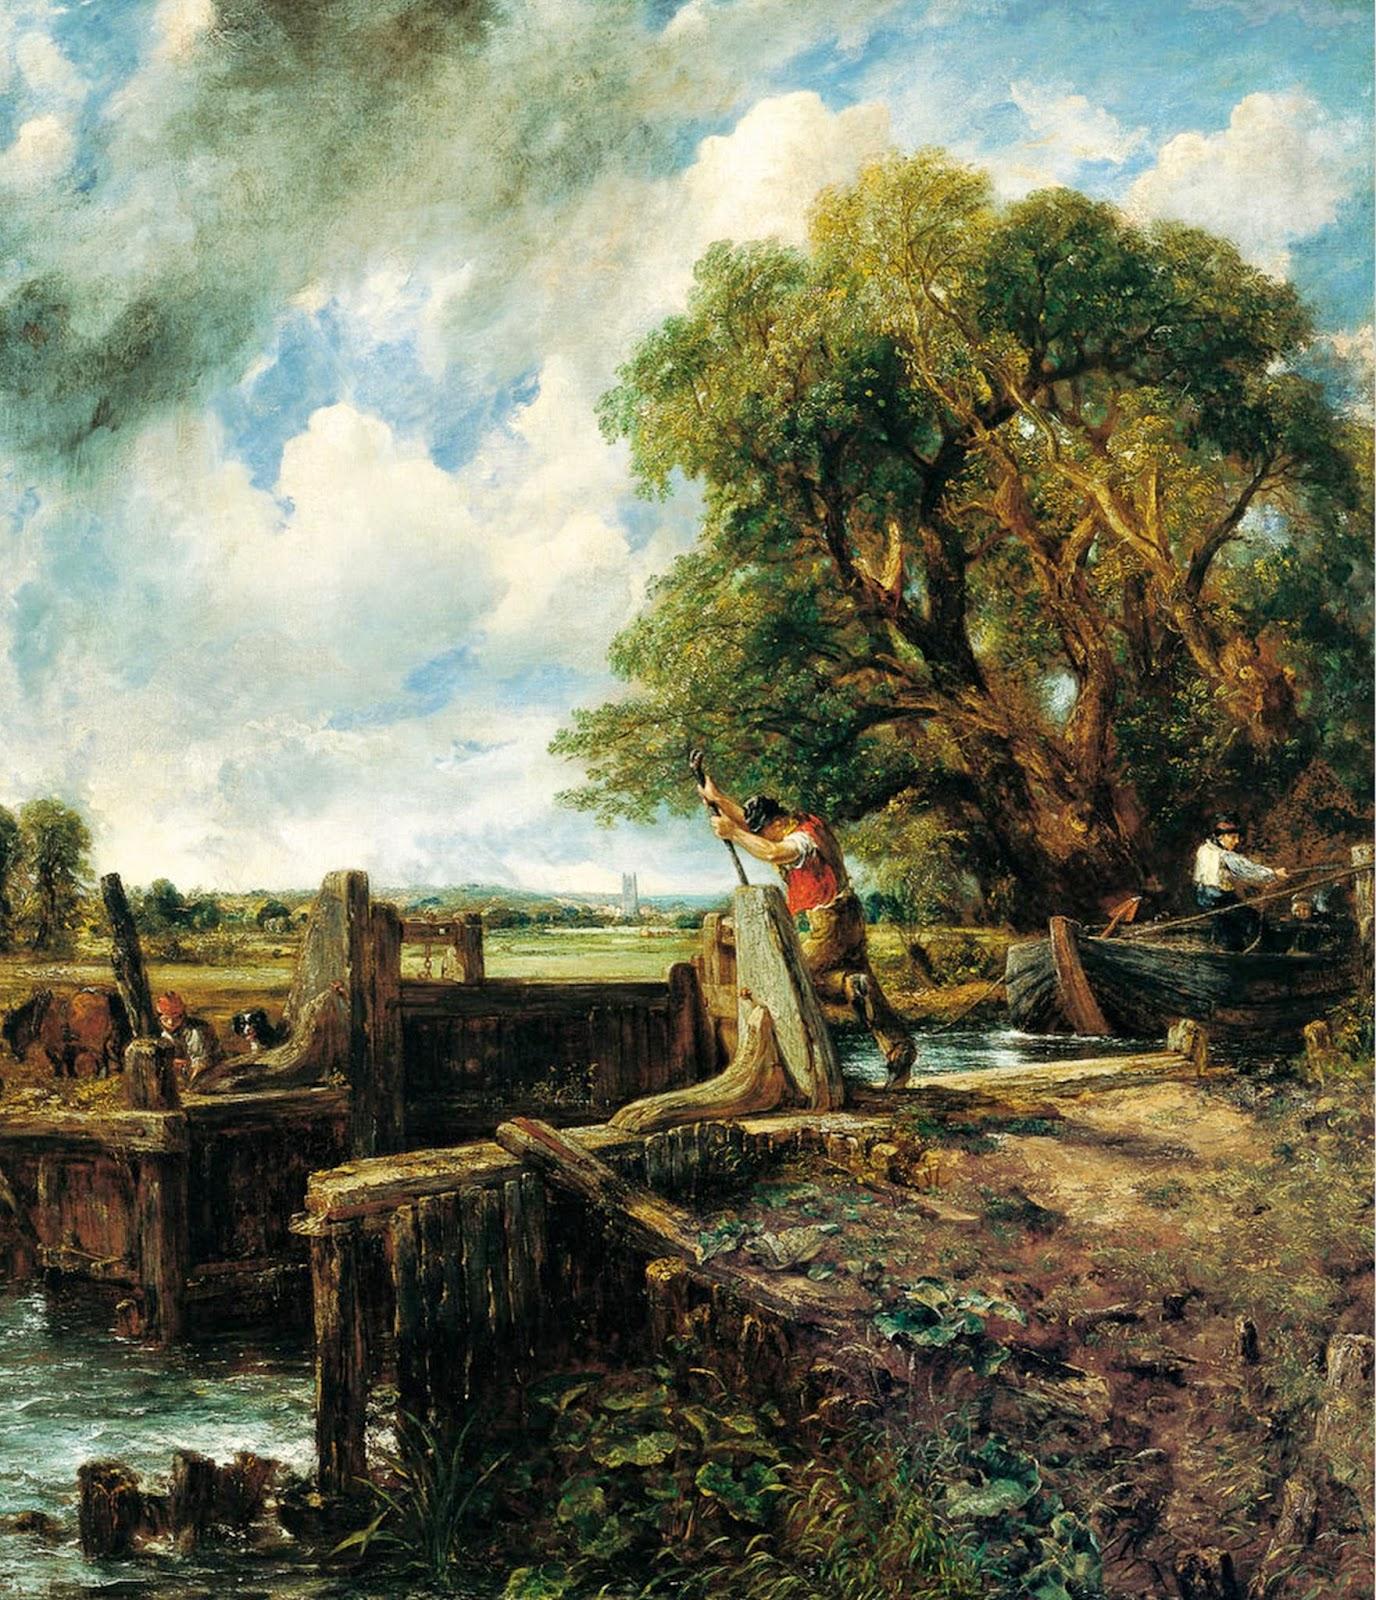 paisajes-campesinos-de-Europa-cuadros-al-oleo